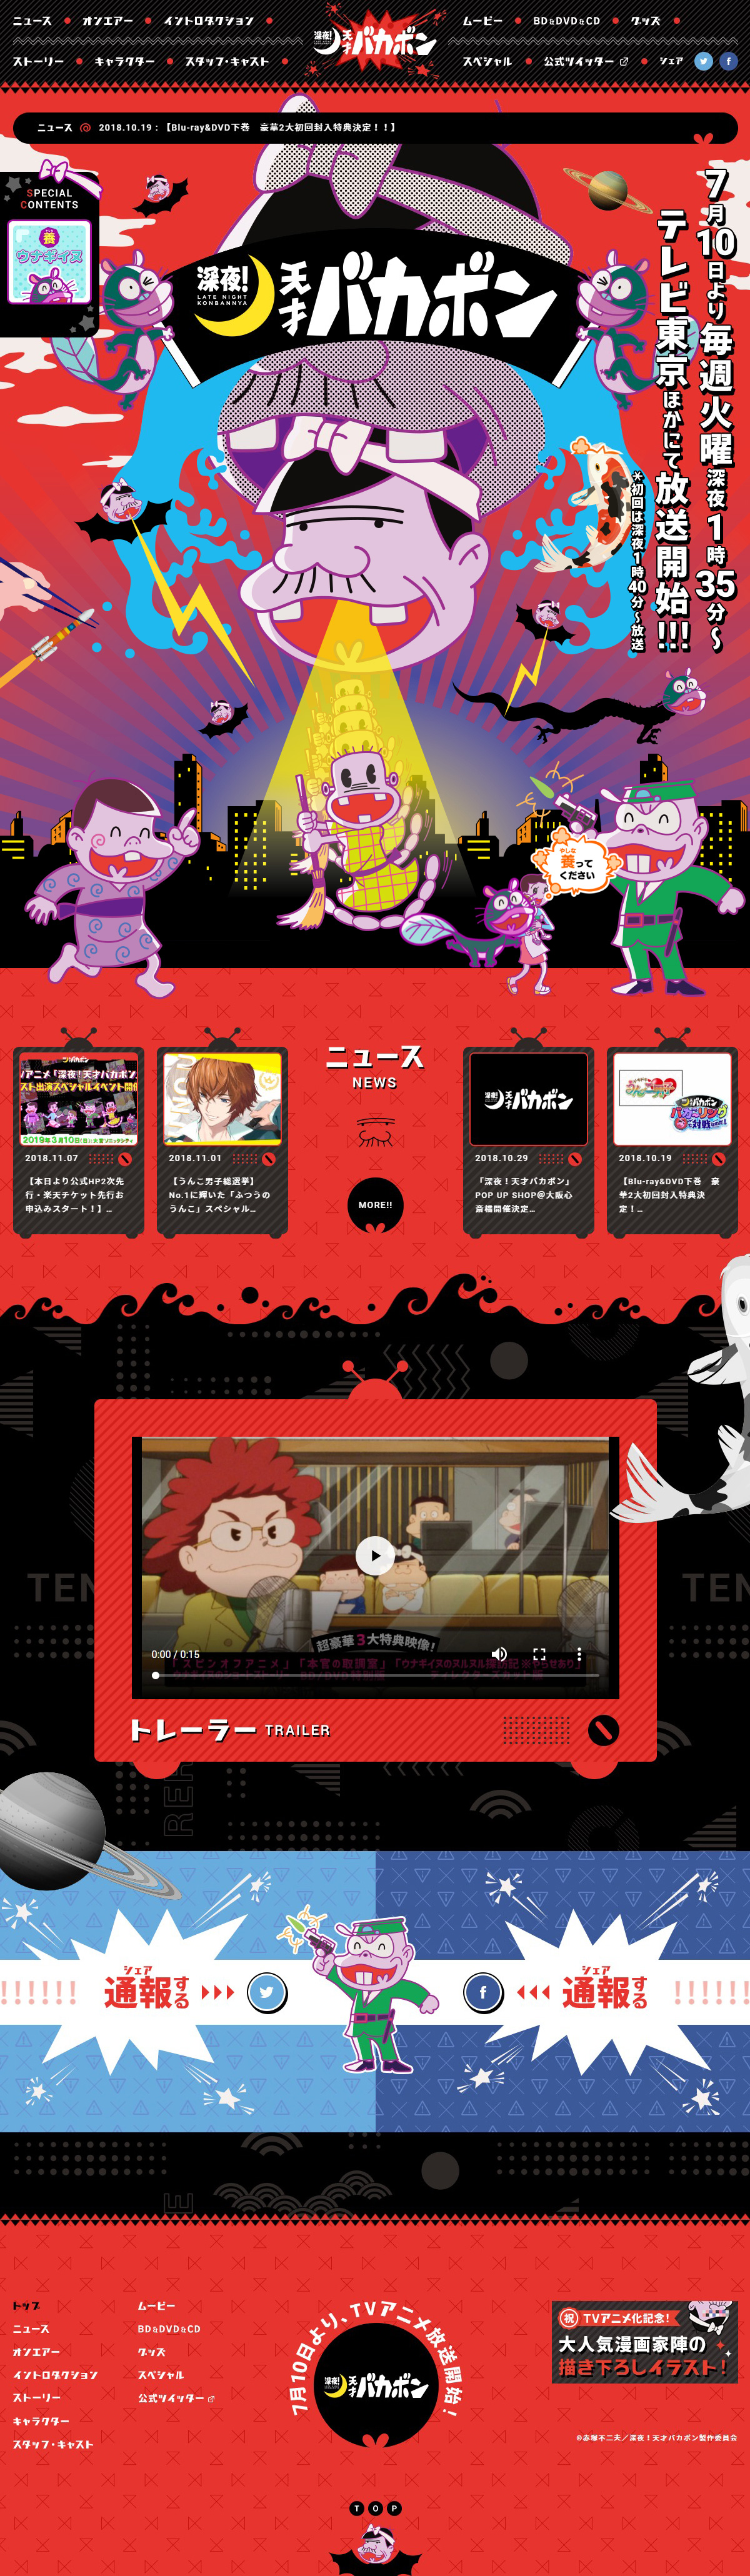 TVアニメ「深夜!天才バカボン」